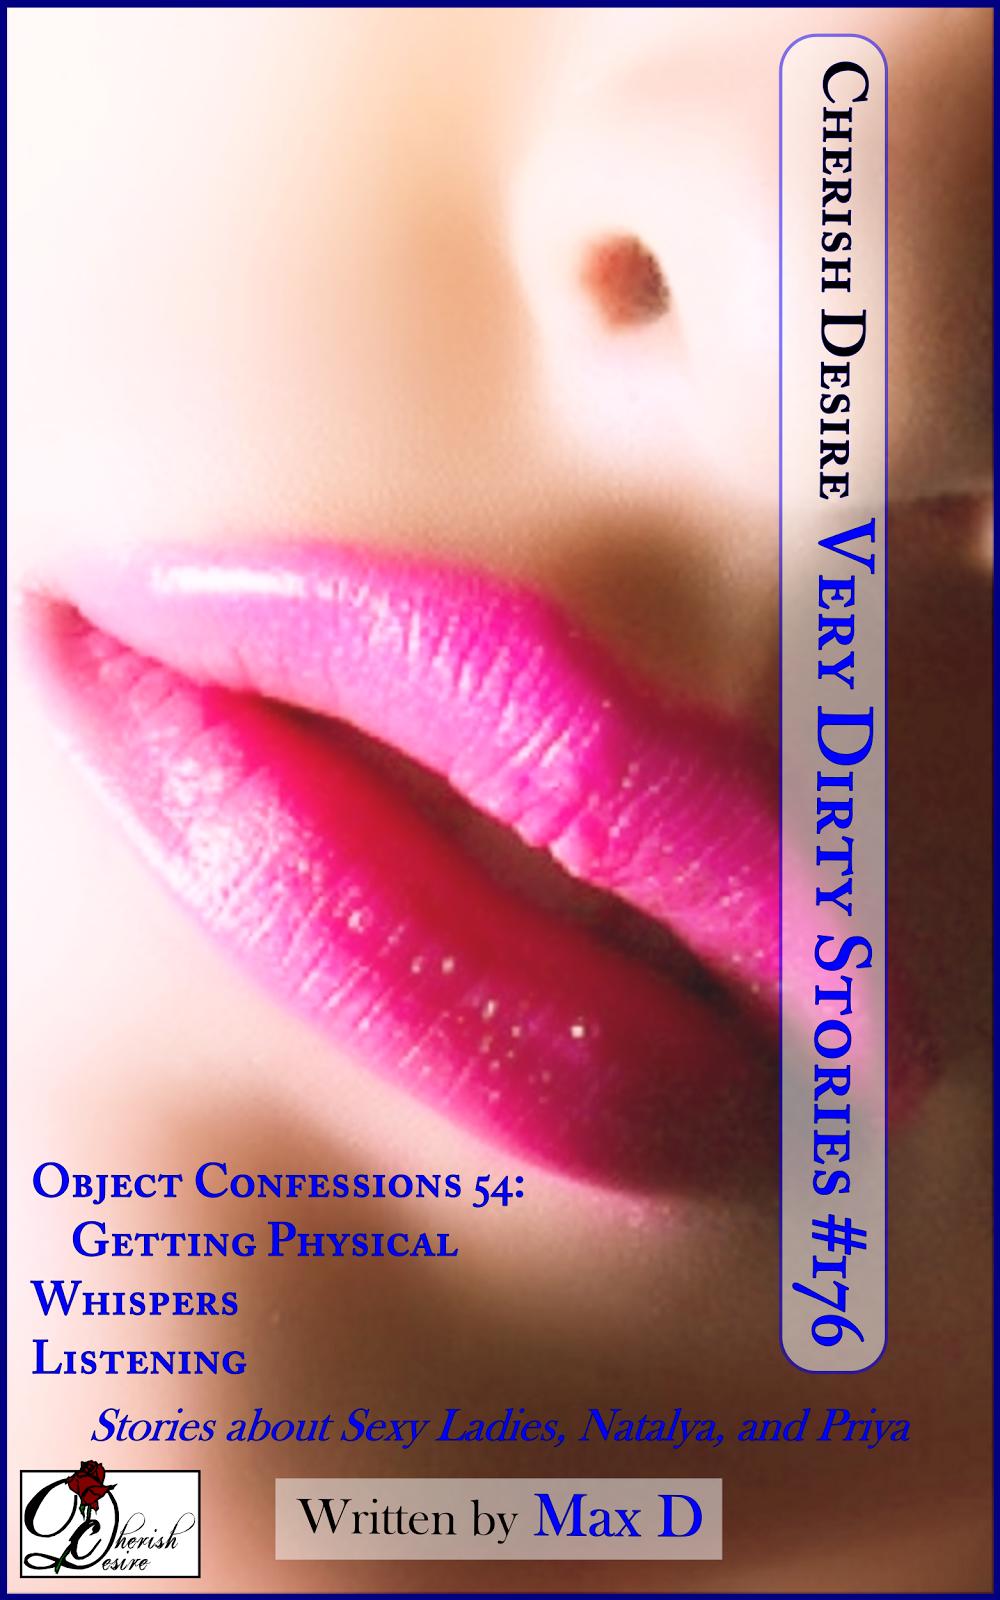 Cherish Desire: Very Dirty Stories #176, Max D, erotica